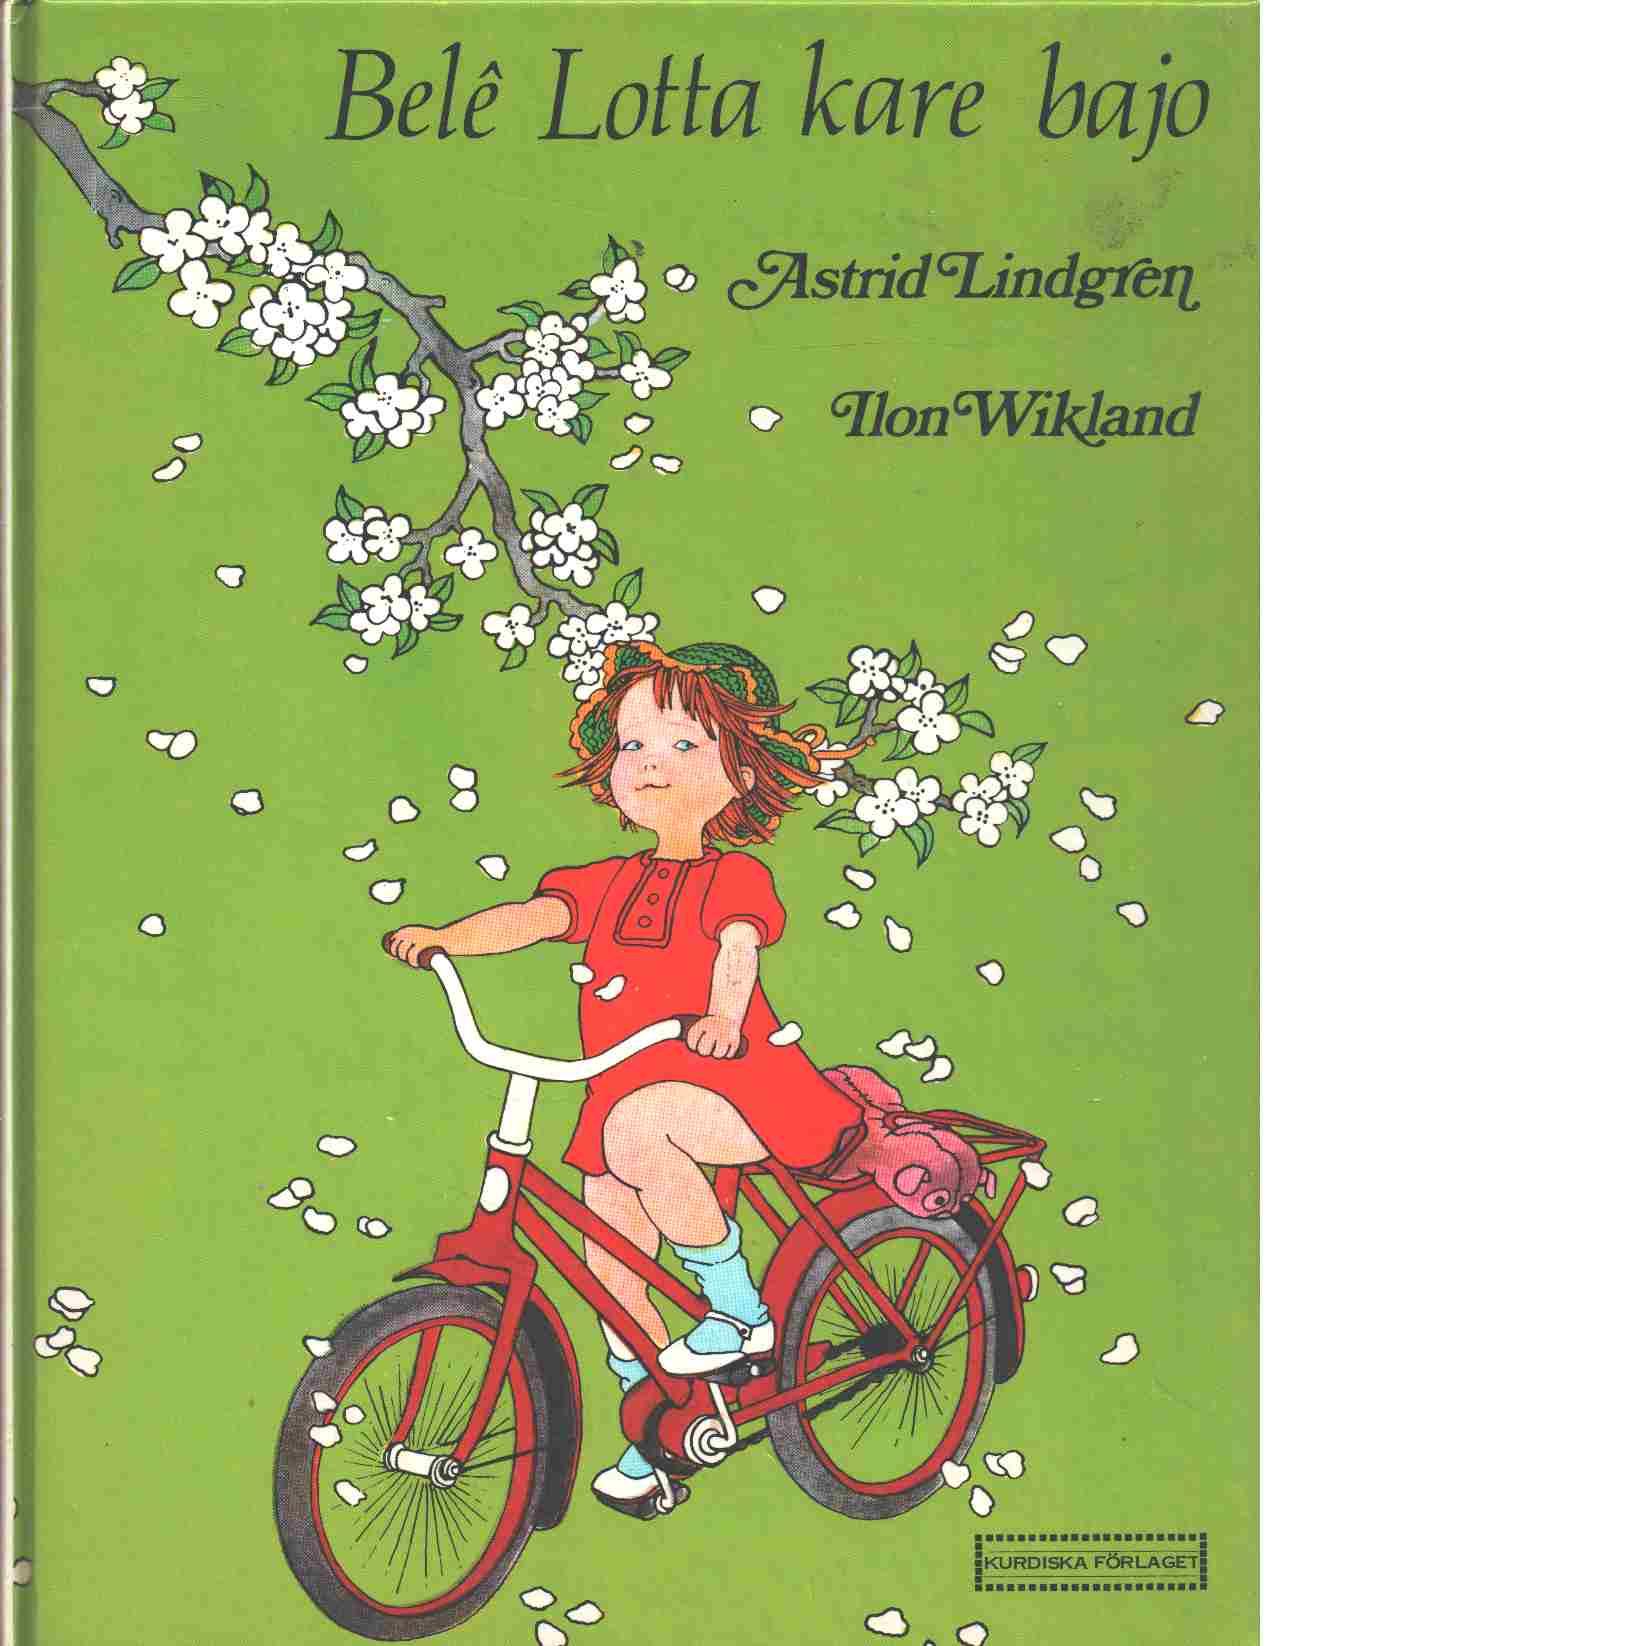 Belê Lotta kare bajo - Lindgren, Astrid